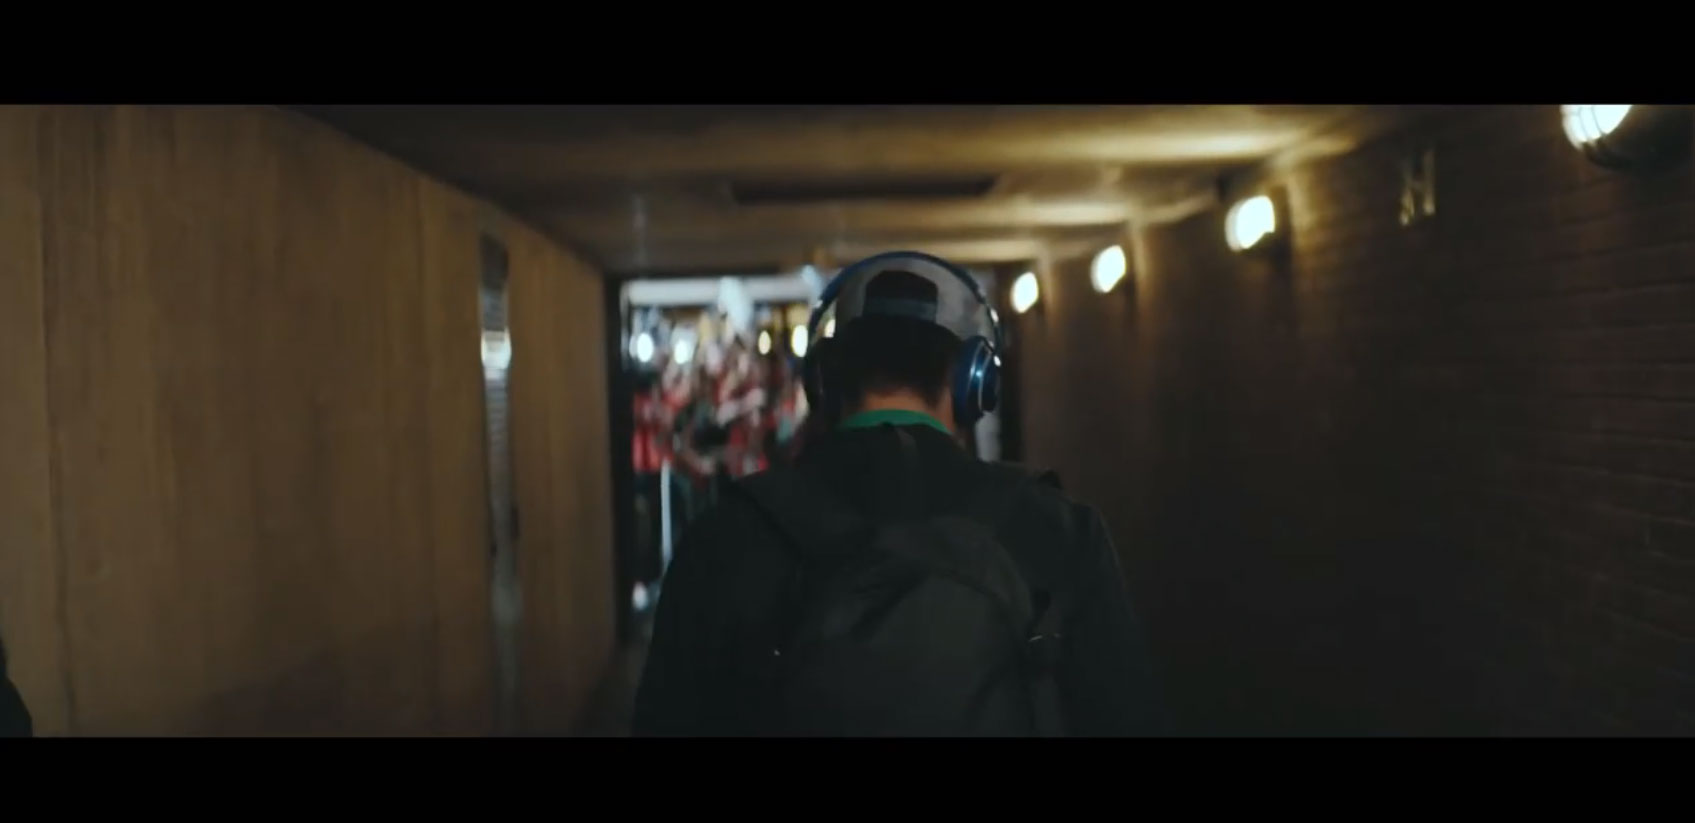 Neymar i reklame for Beats by Dre